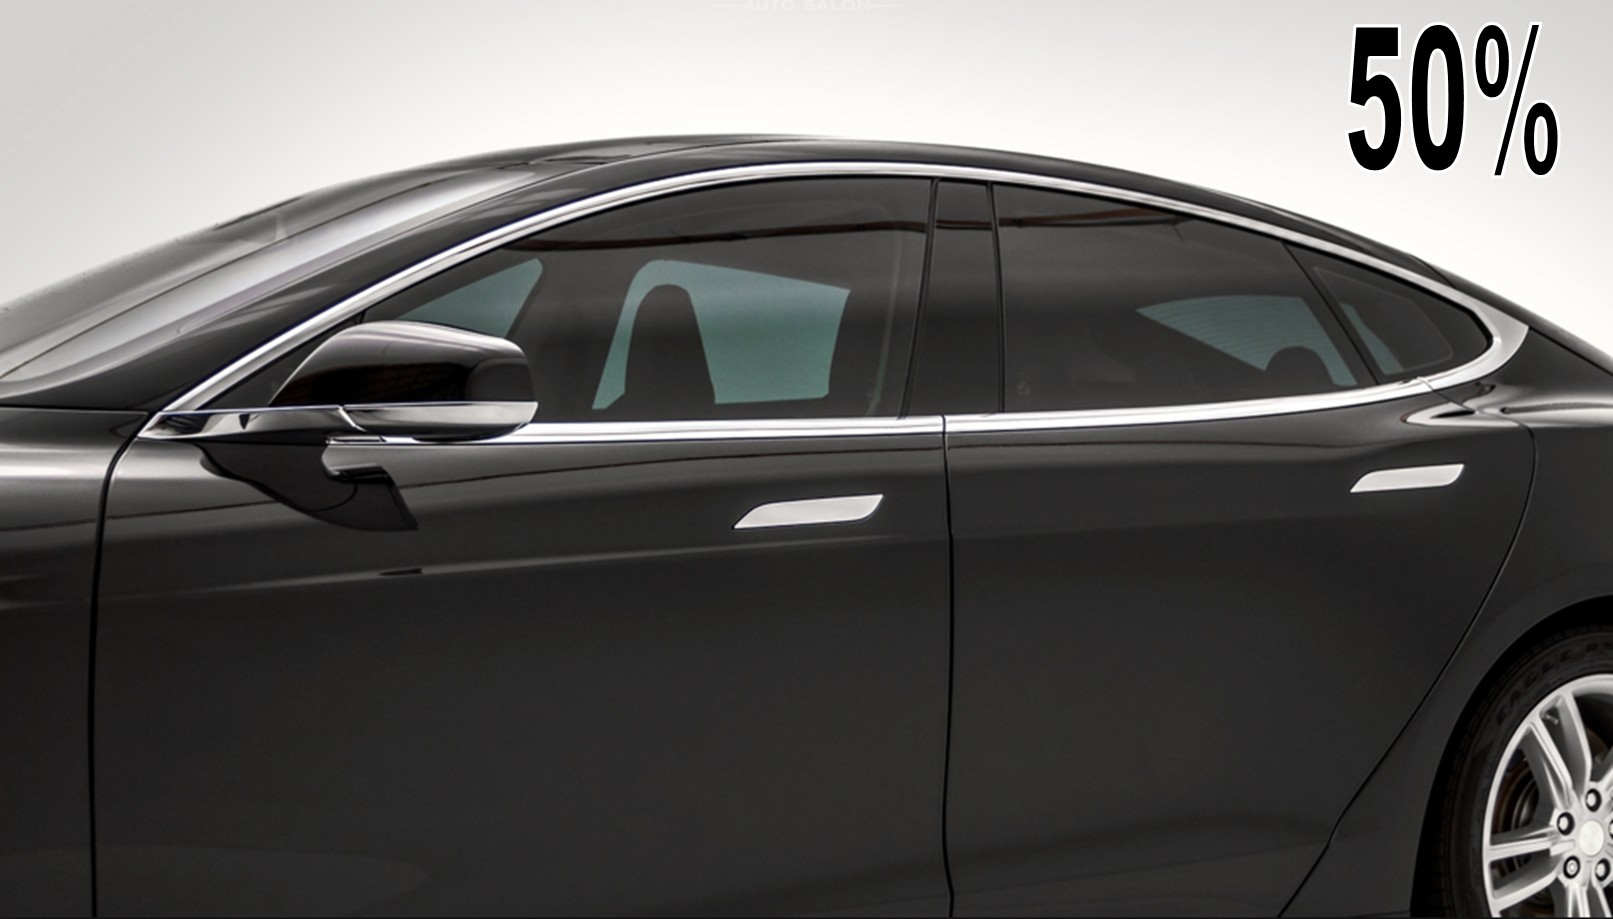 Premium 50 Limo Charcoal Dyed Polyester Car Window Tint Film Kaca Oneway